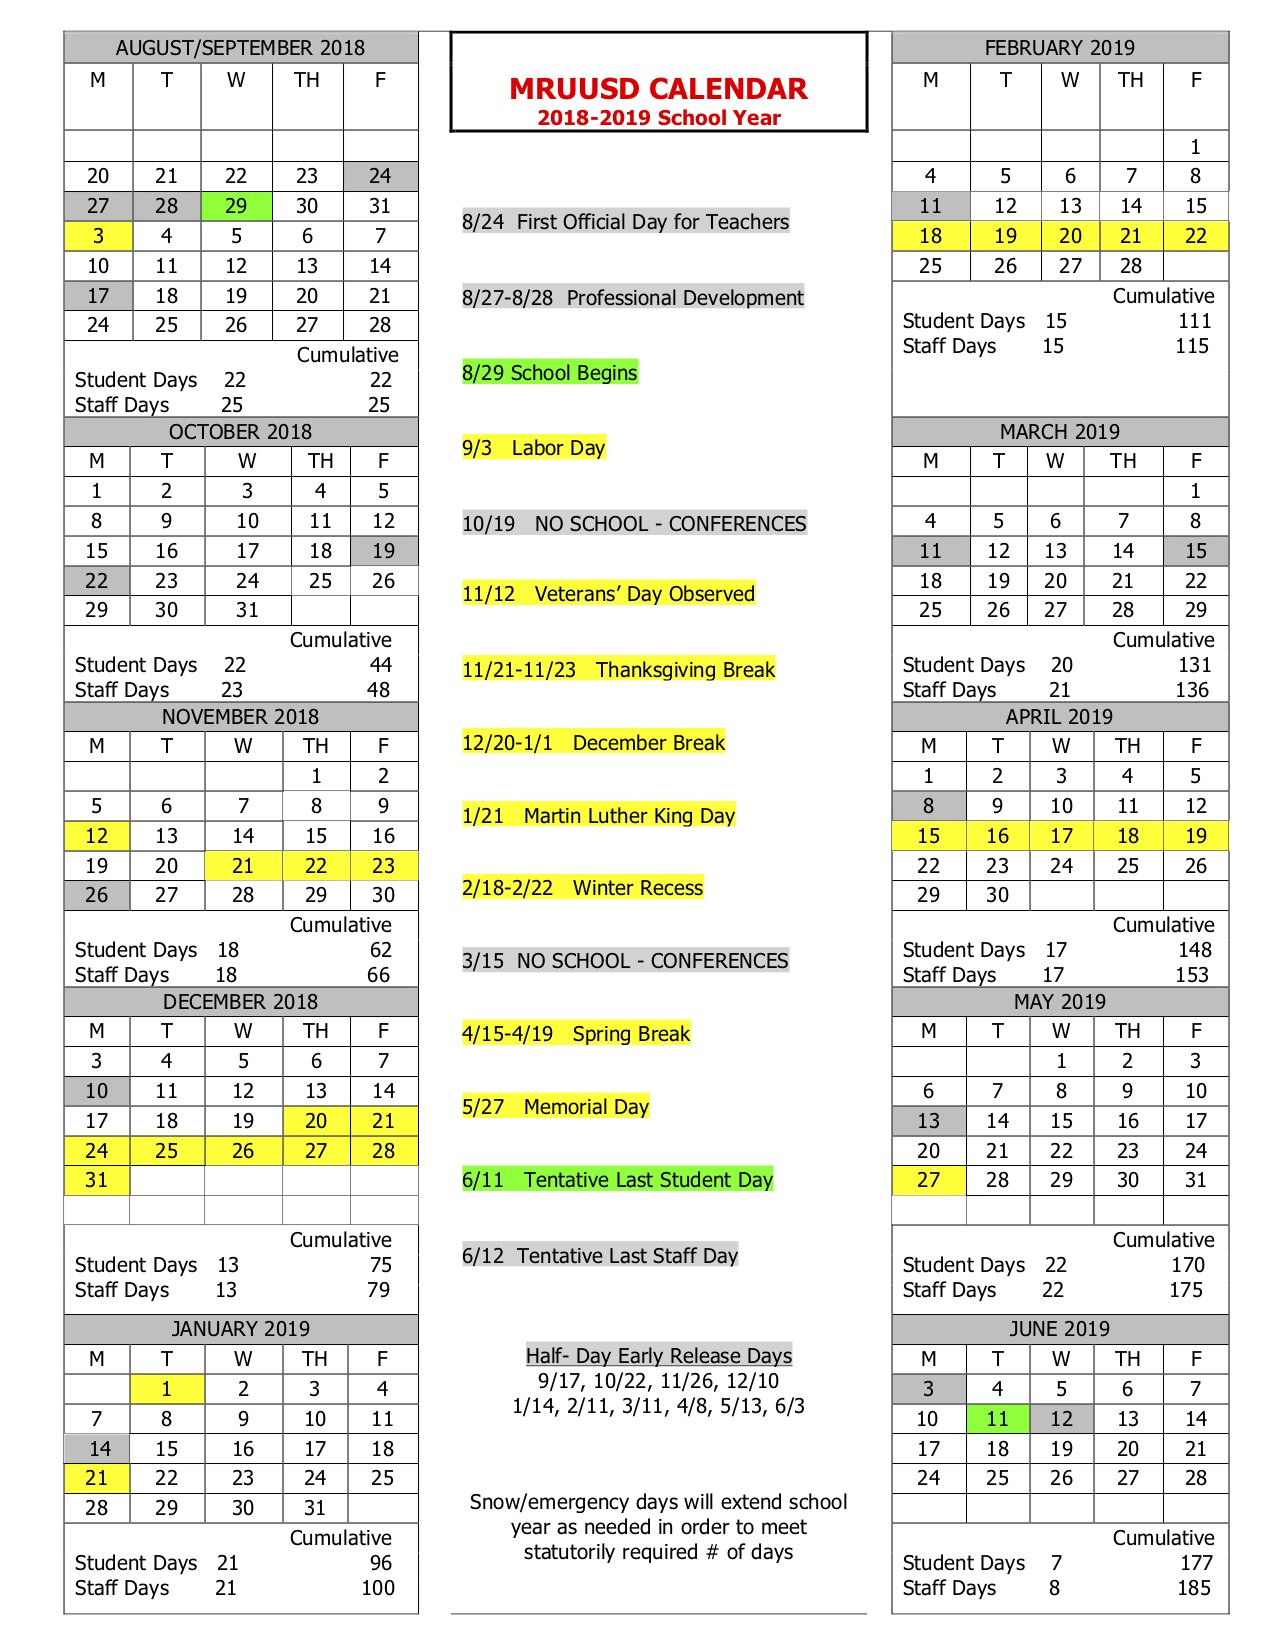 Academic Calendar Vt December 2019 School year Calendar – Mill River Union High School